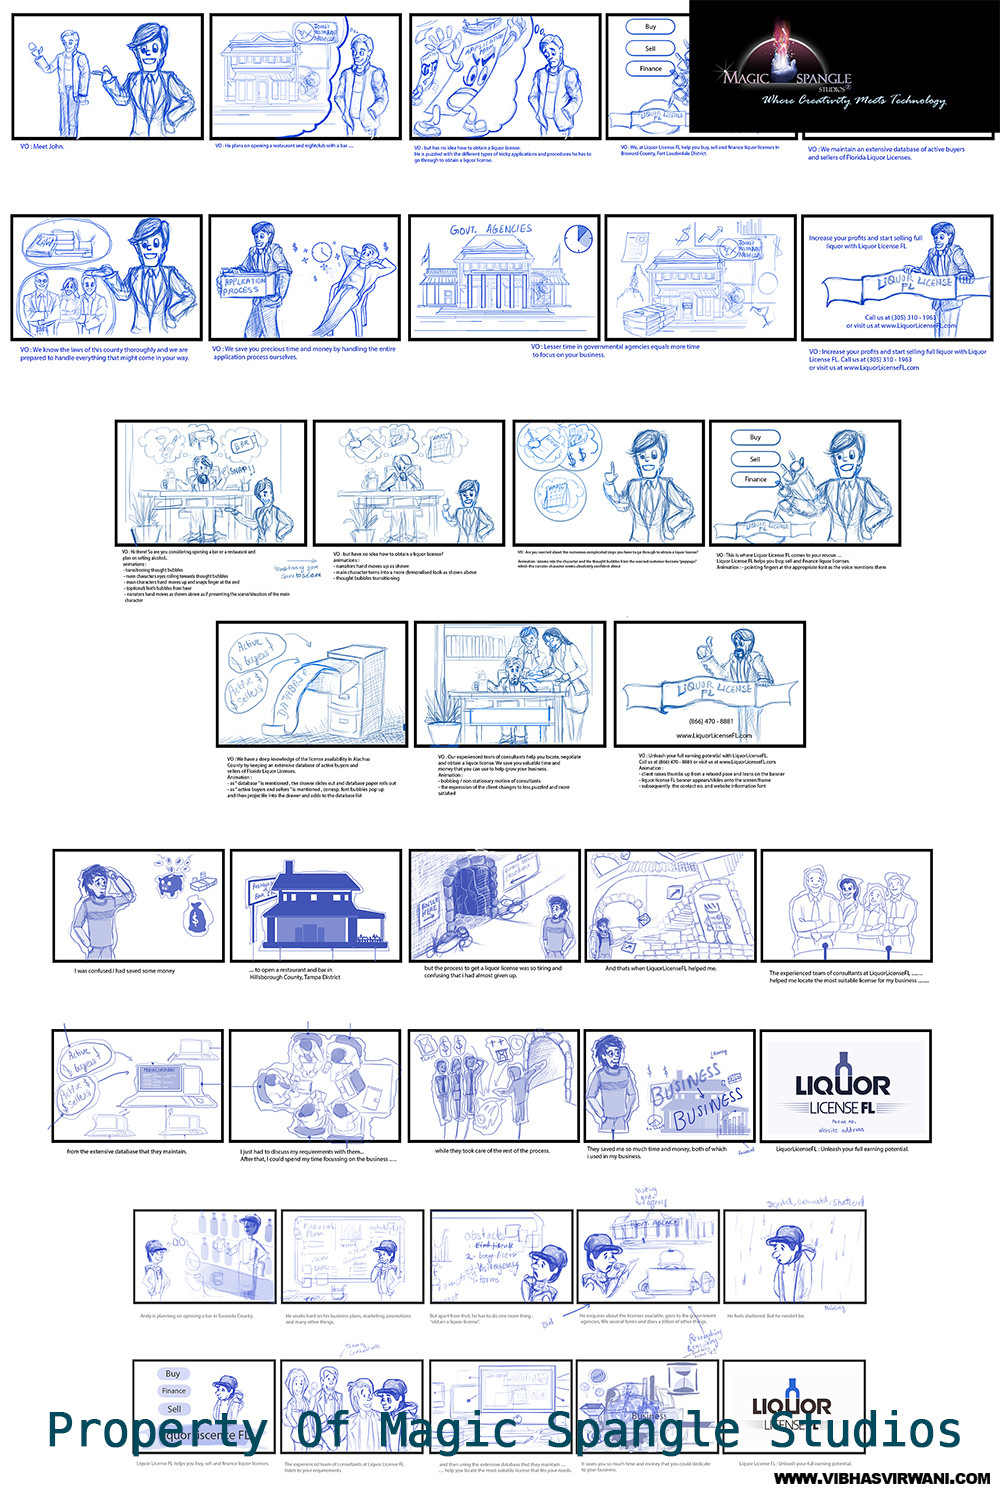 Liquor license florida storyboards